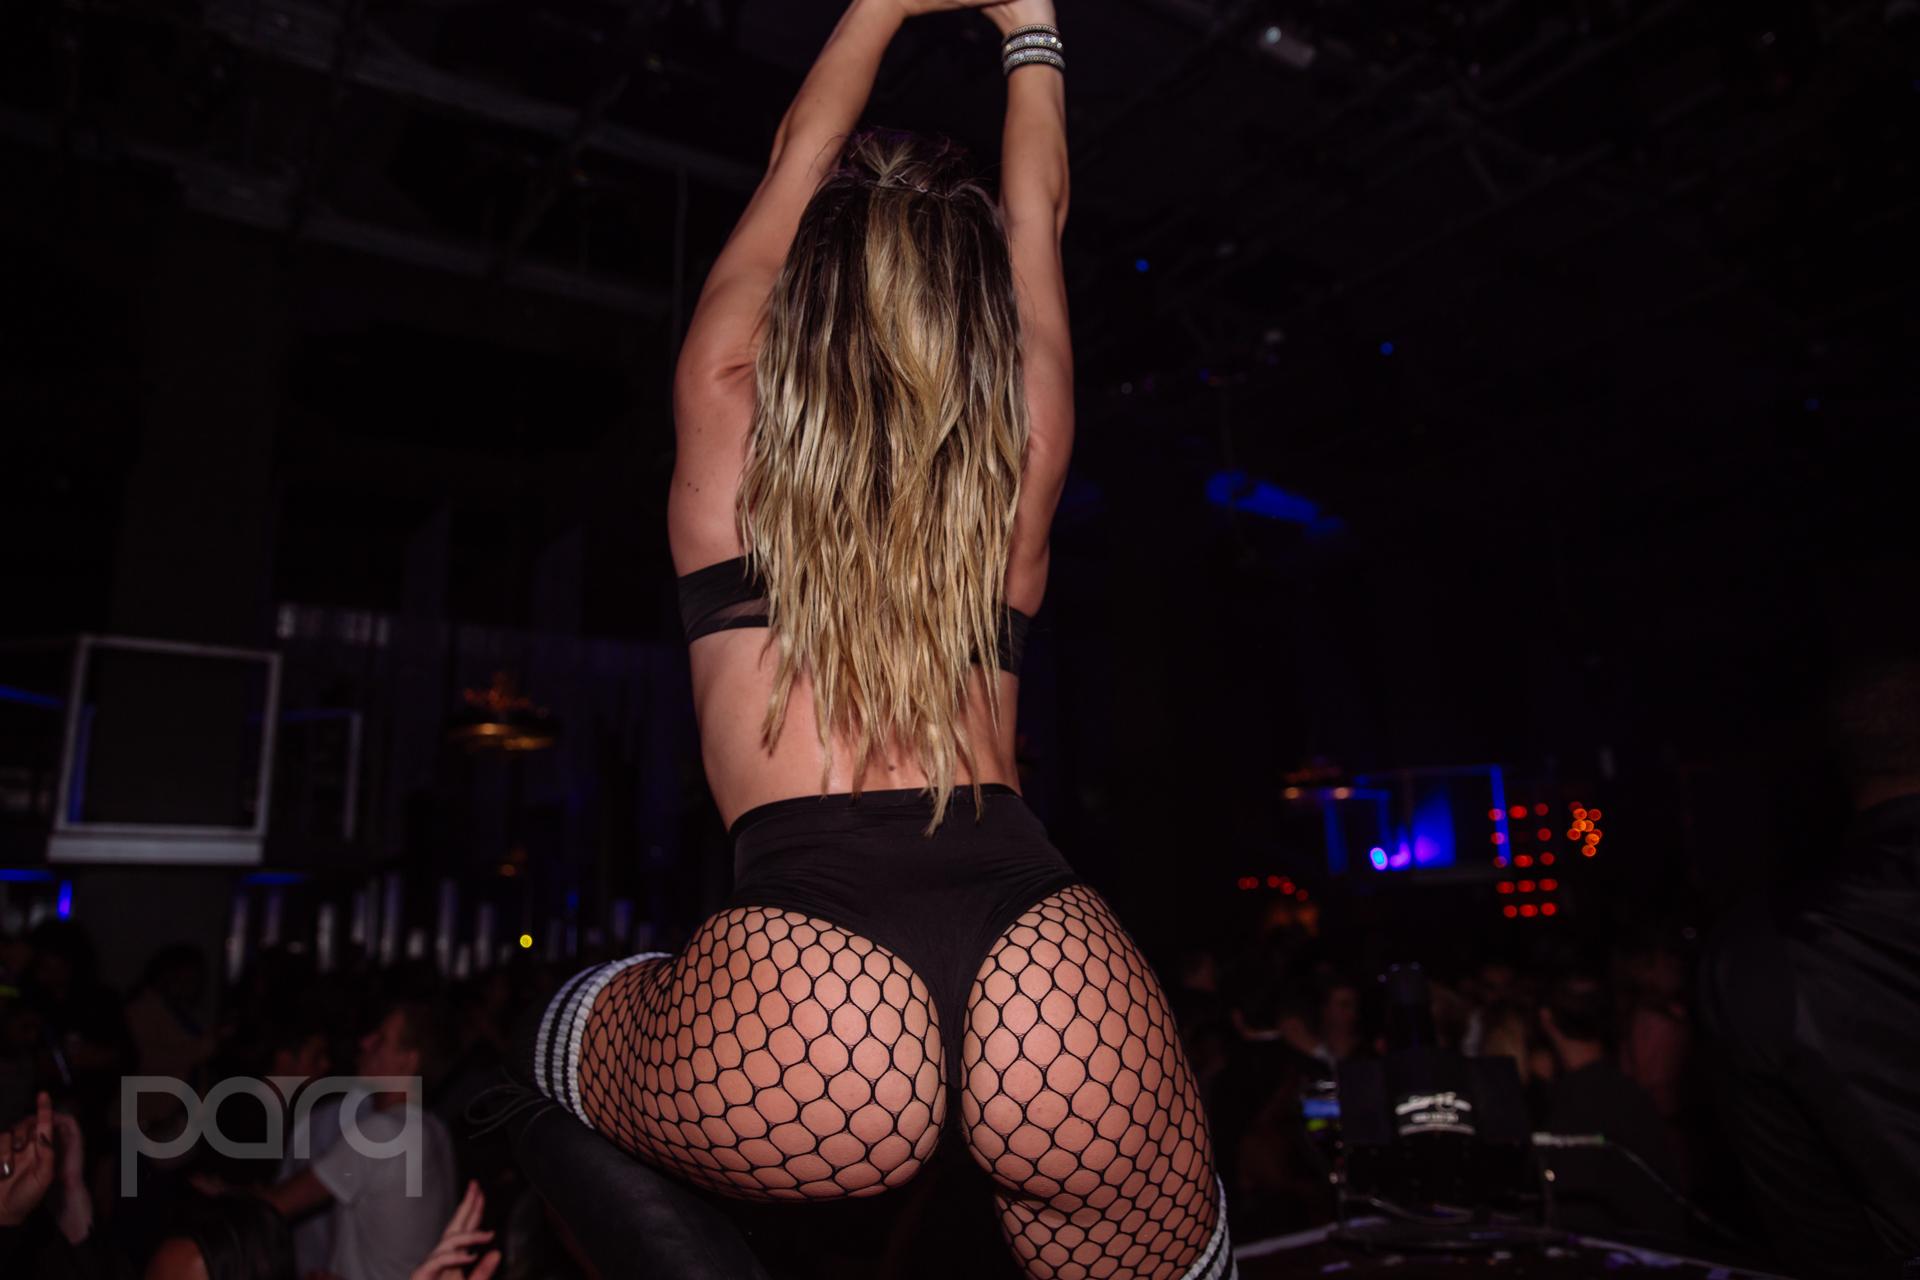 01.19.18 Parq - DJ Hollywood-21.jpg